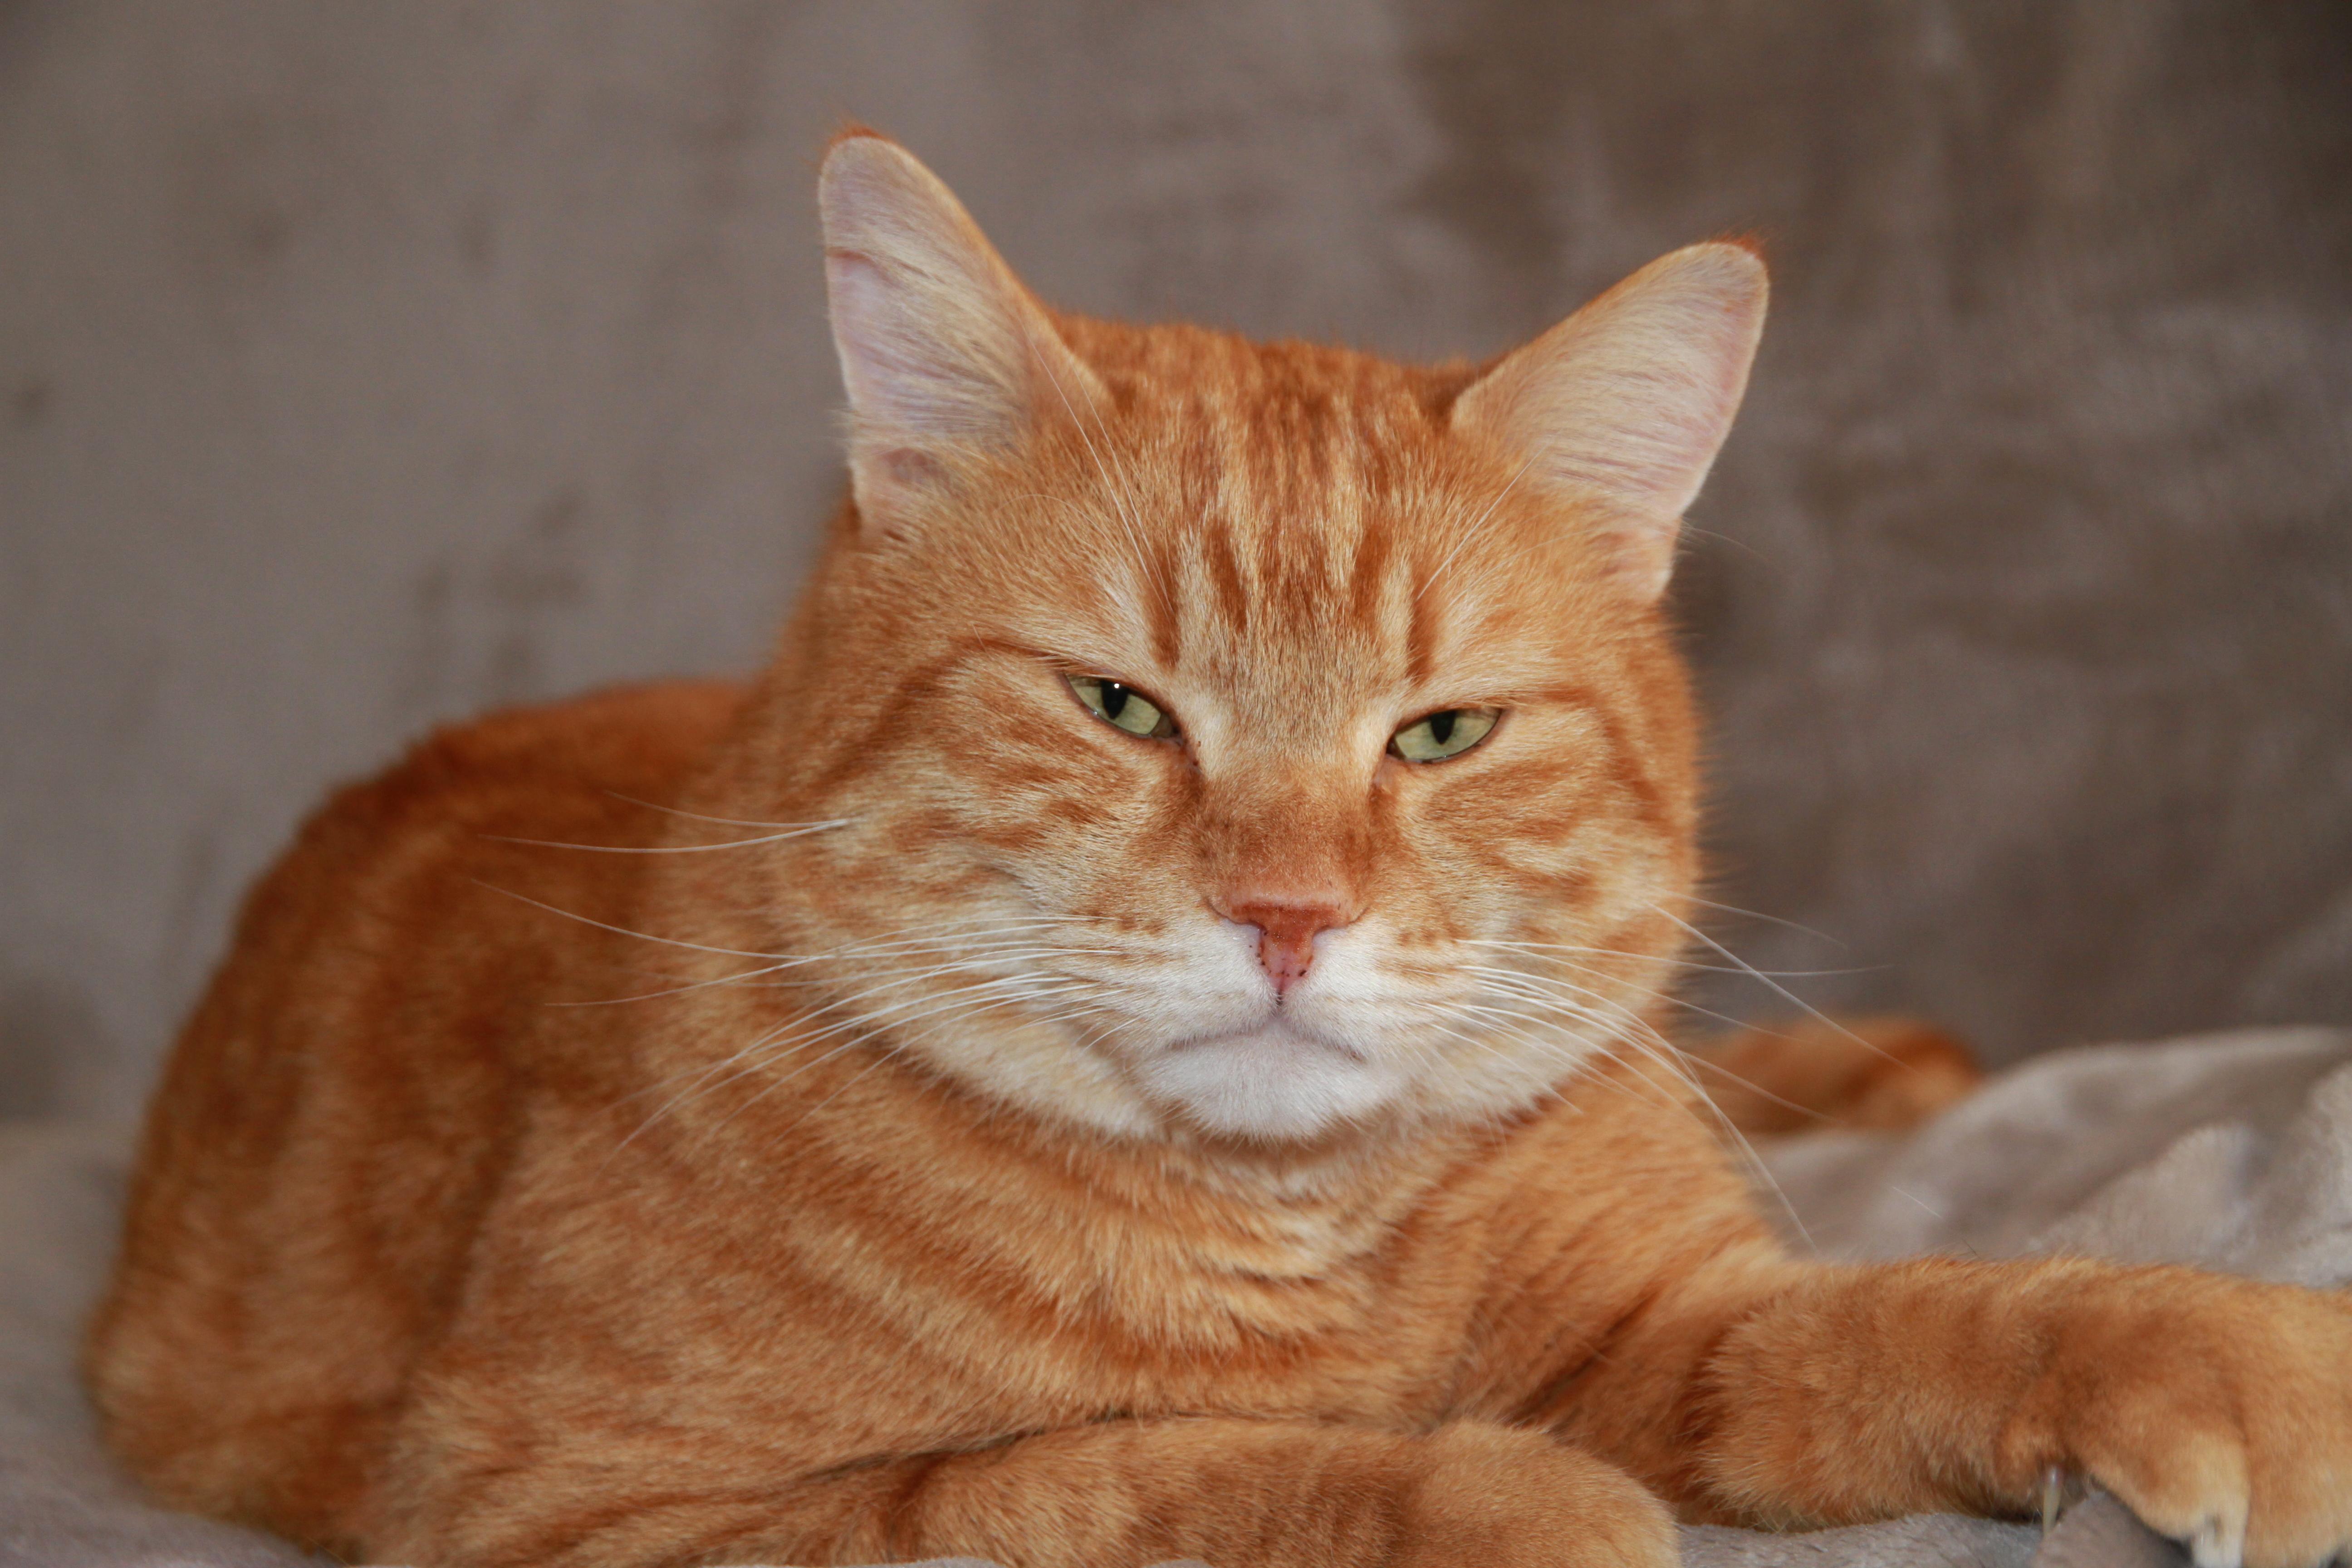 Le chat Caramel